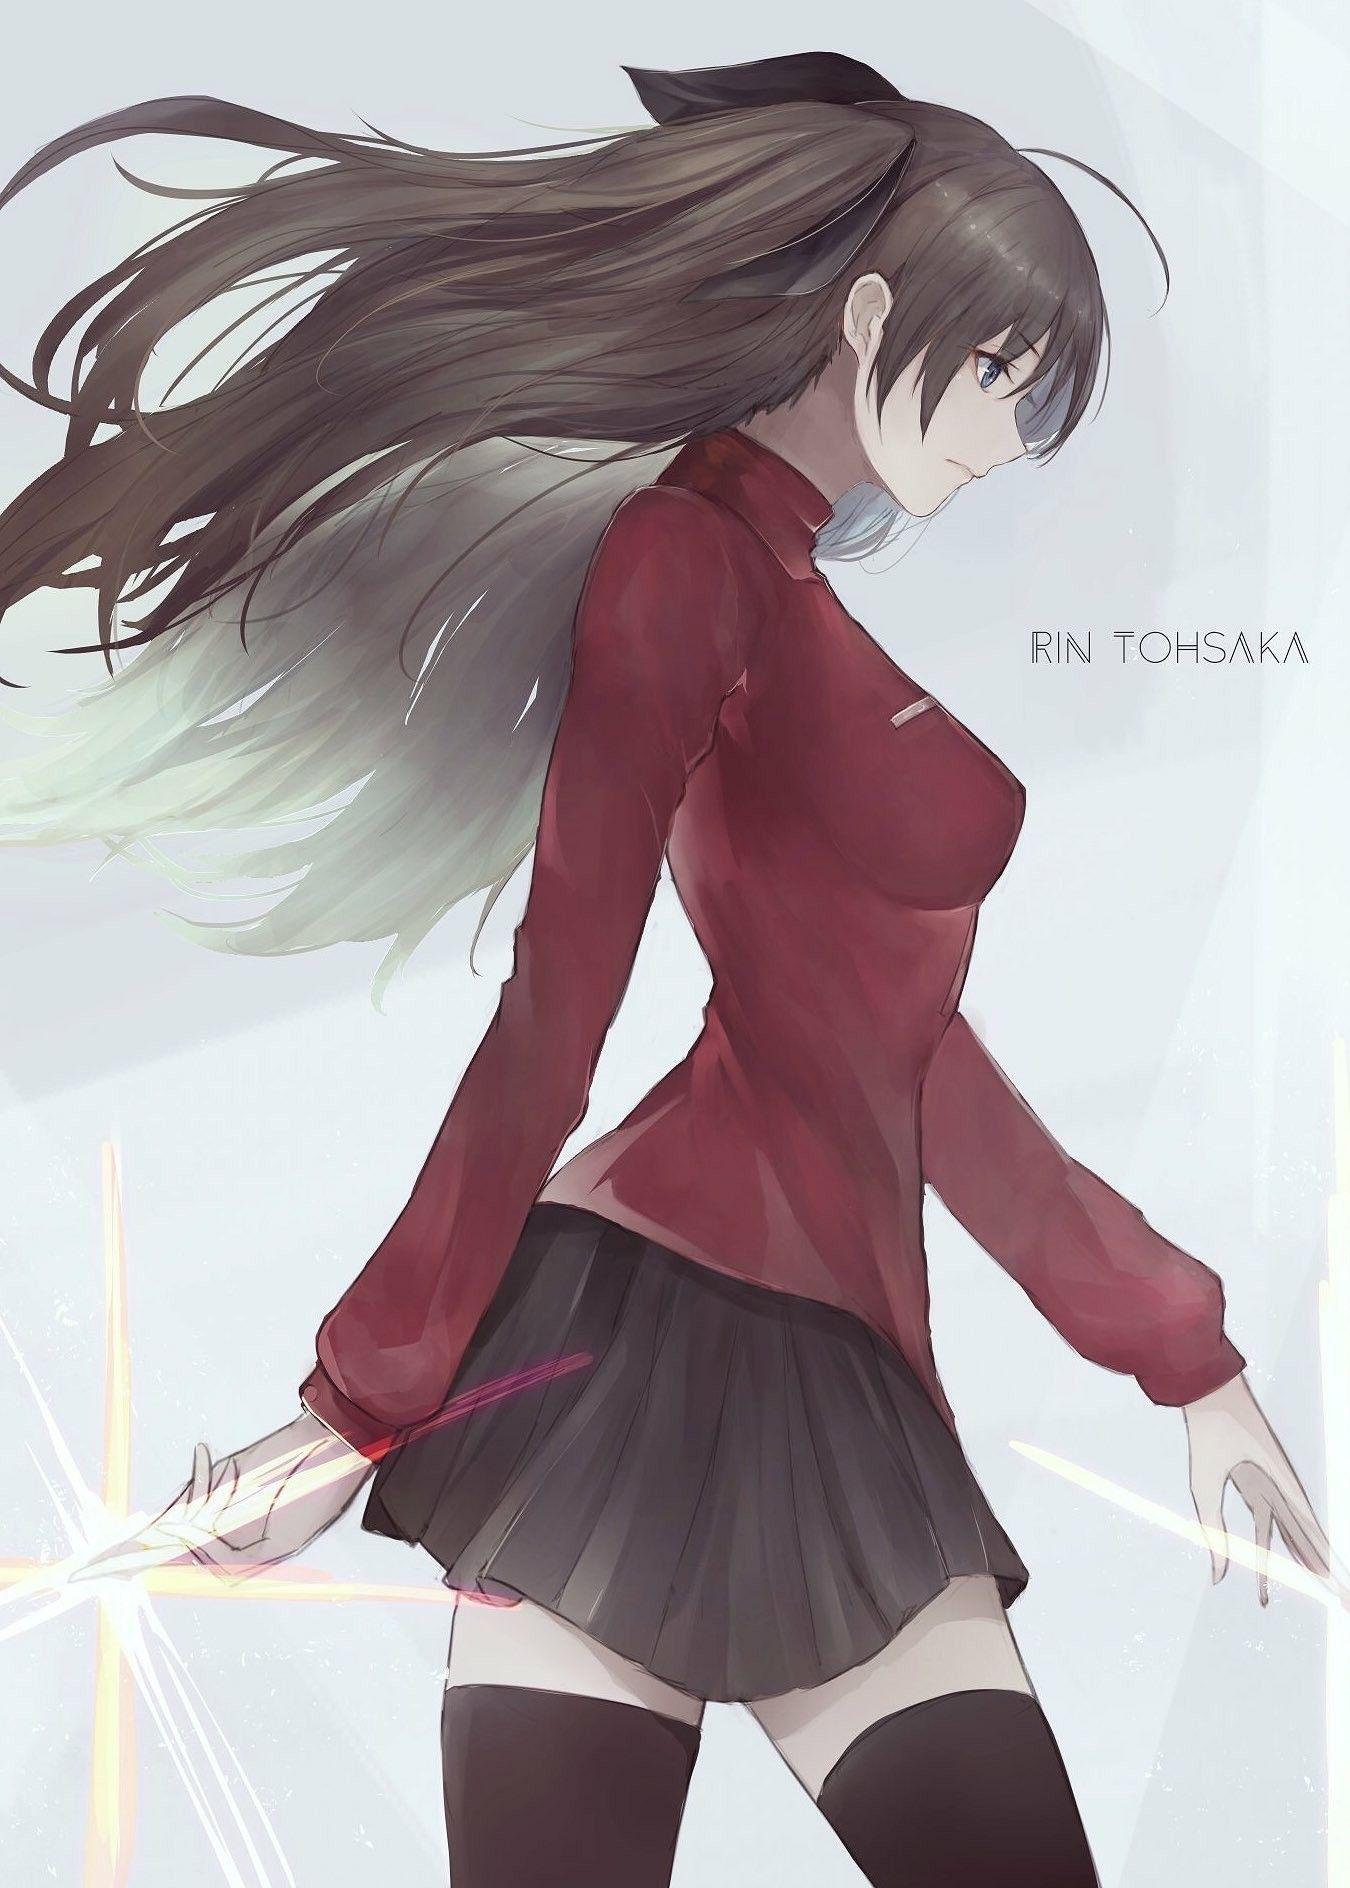 Rin Tohsaka Fate Stay Night Rin Tohsaka Rin Fate Stay Night Anime